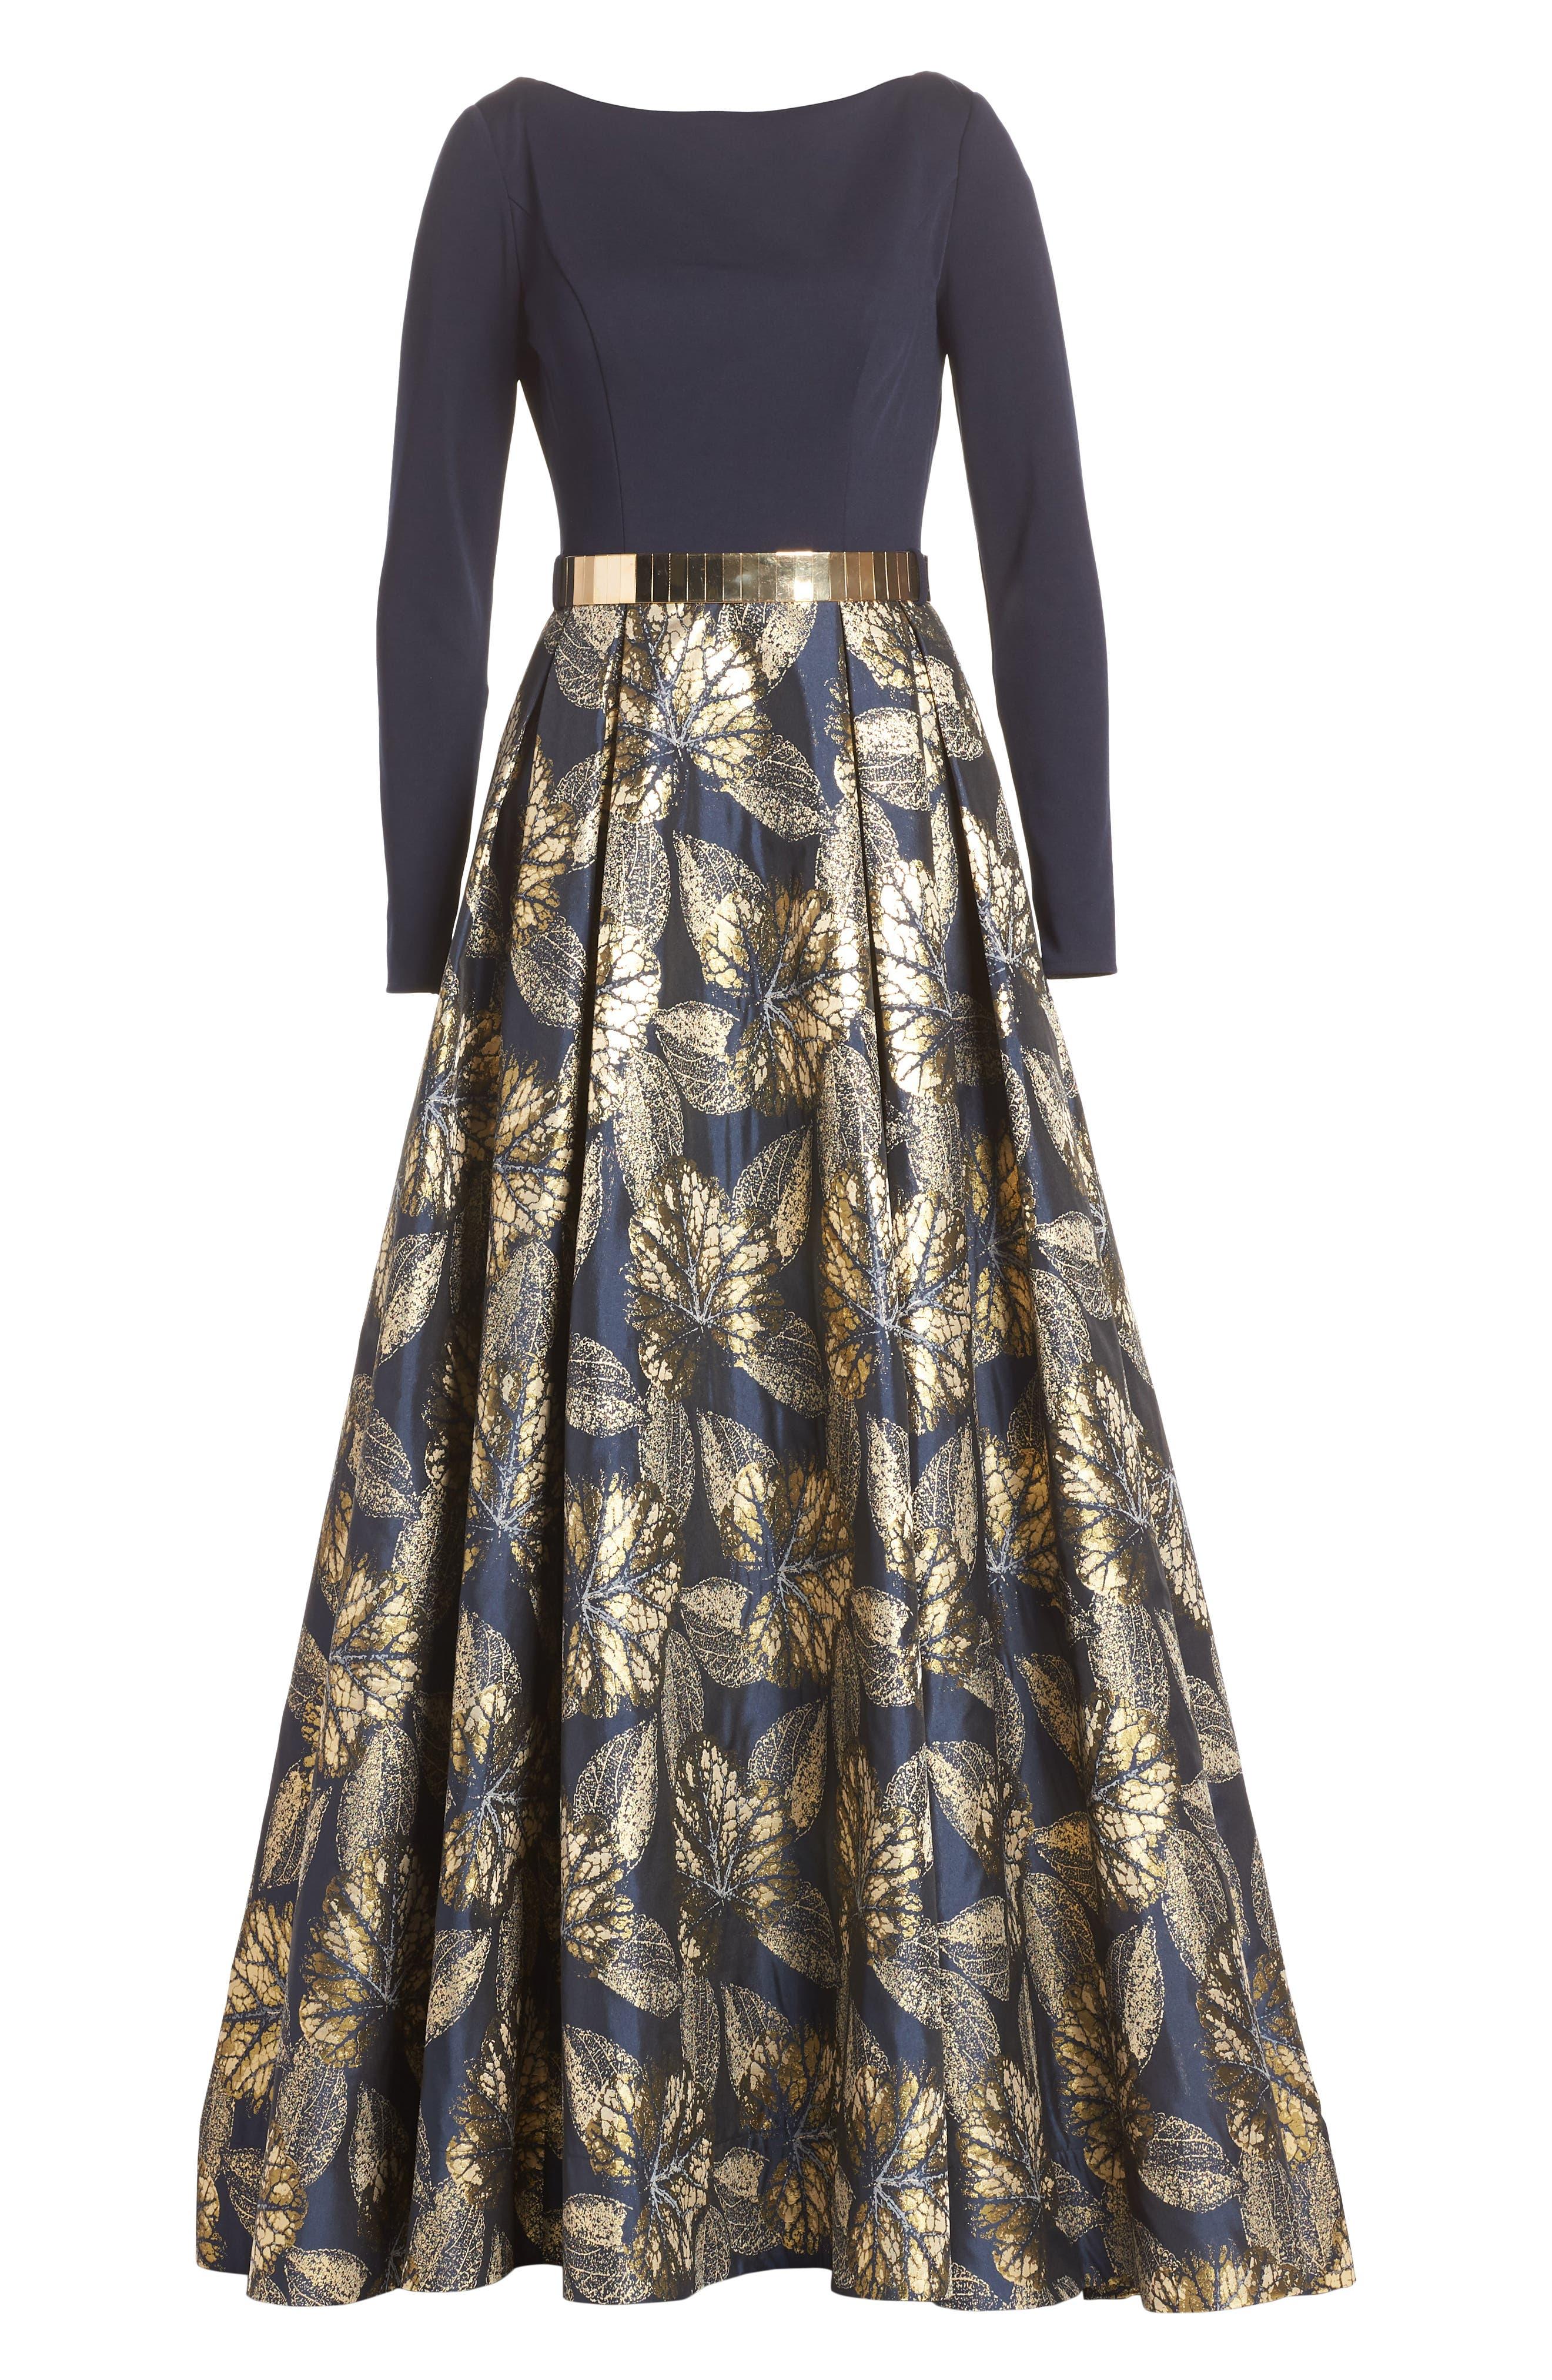 IEENA FOR MAC DUGGAL, Mac Duggal Long Sleeve Metallic Waist Print Gown, Alternate thumbnail 6, color, NAVY GOLD